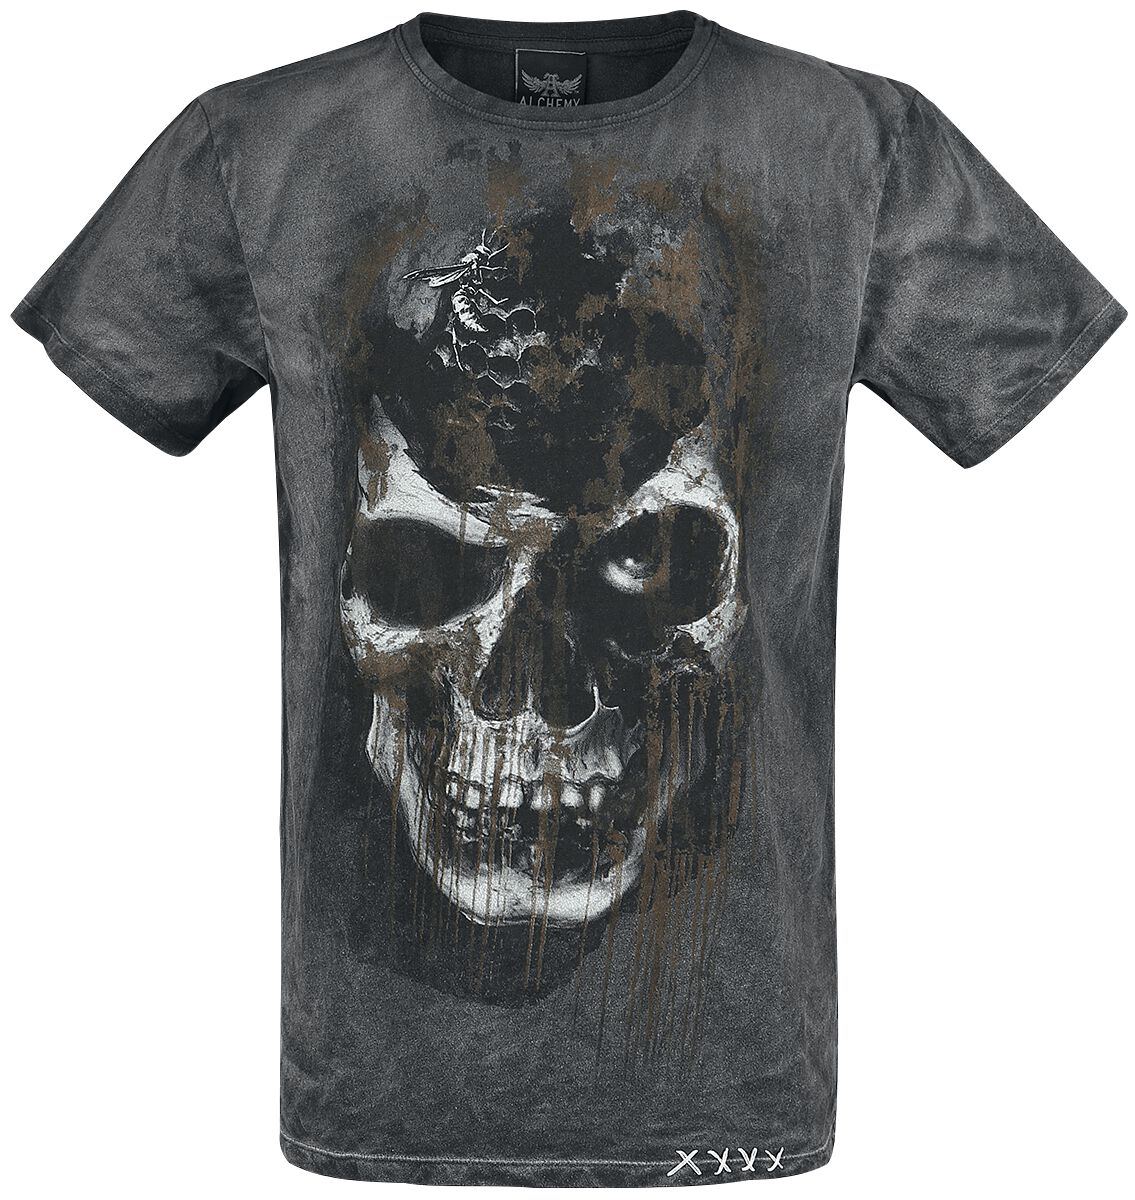 Image of   Alchemy England Pole Axed T-Shirt grå